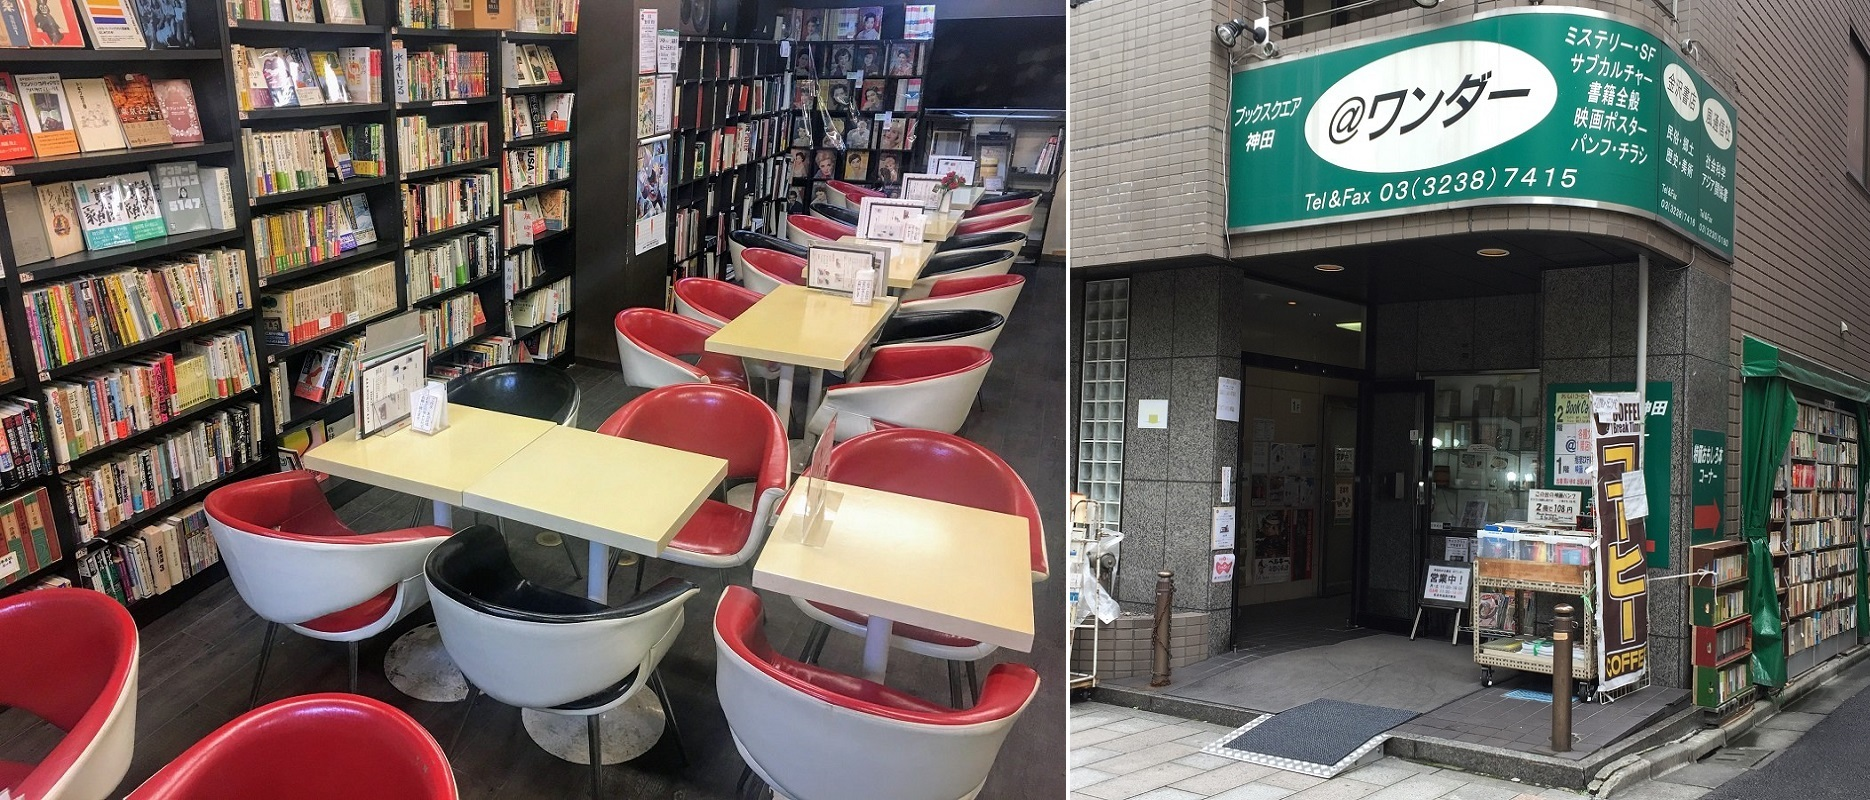 bookcafe201710.jpg